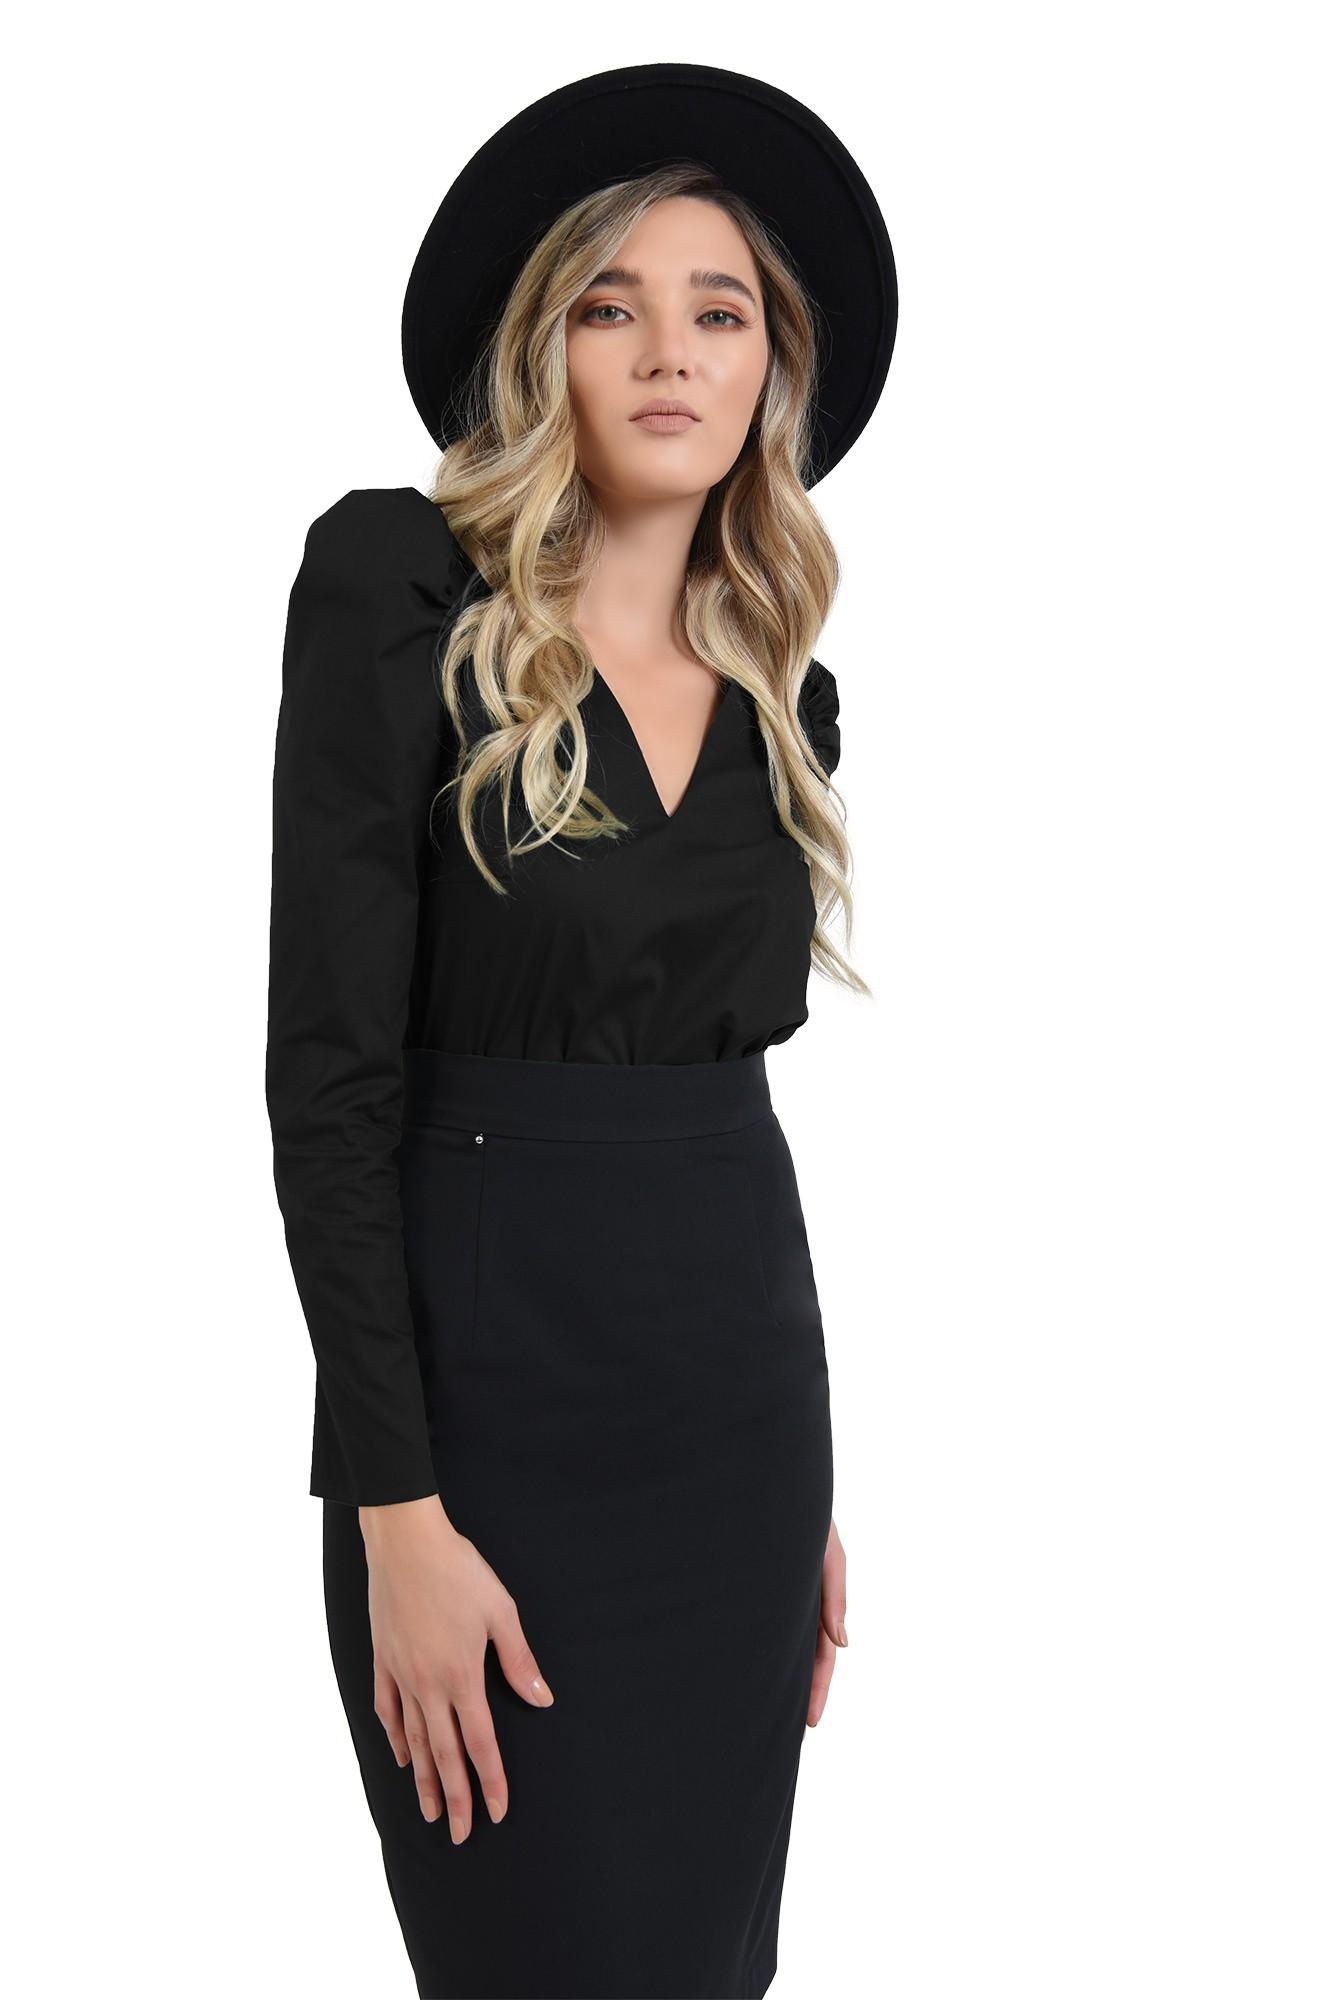 bluza neagra, cu umeri accentuati, cu maneca lunga